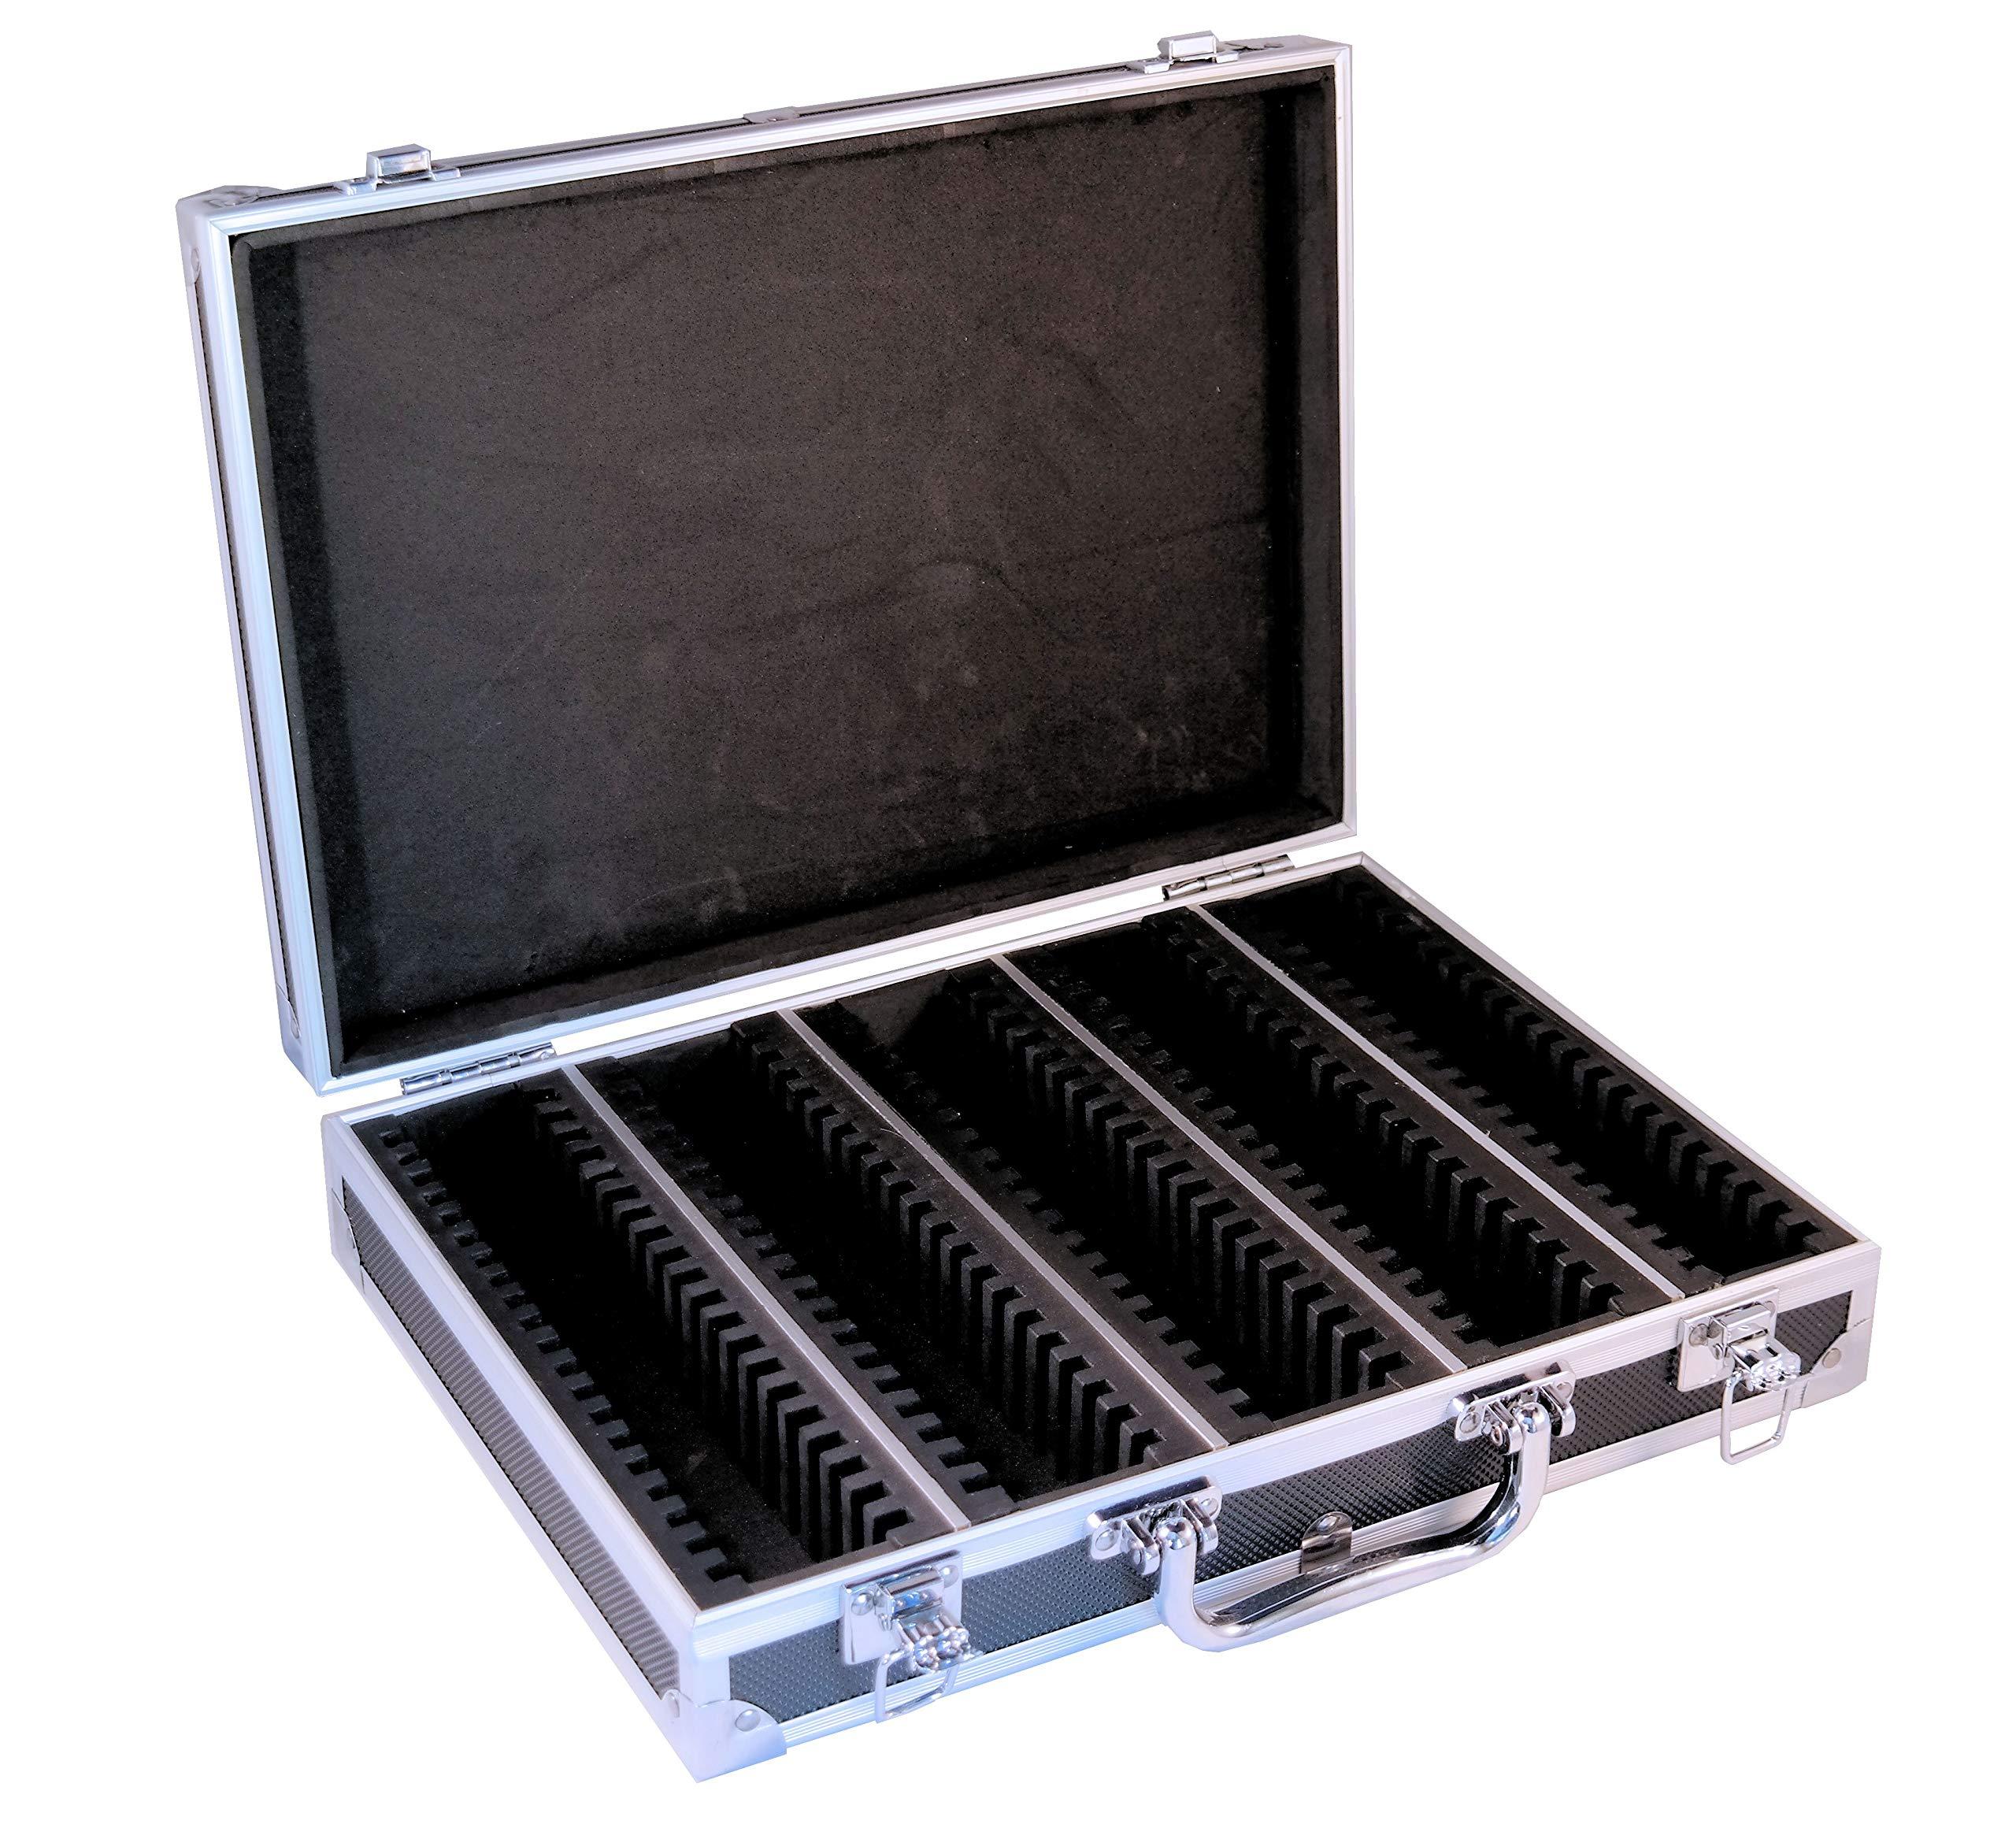 Ursae Minoris Elite Black Aluminum Box for 100 Capsule (Large or XL) or 2 x 2 Coin Holders by Ursae Minoris Display Systems